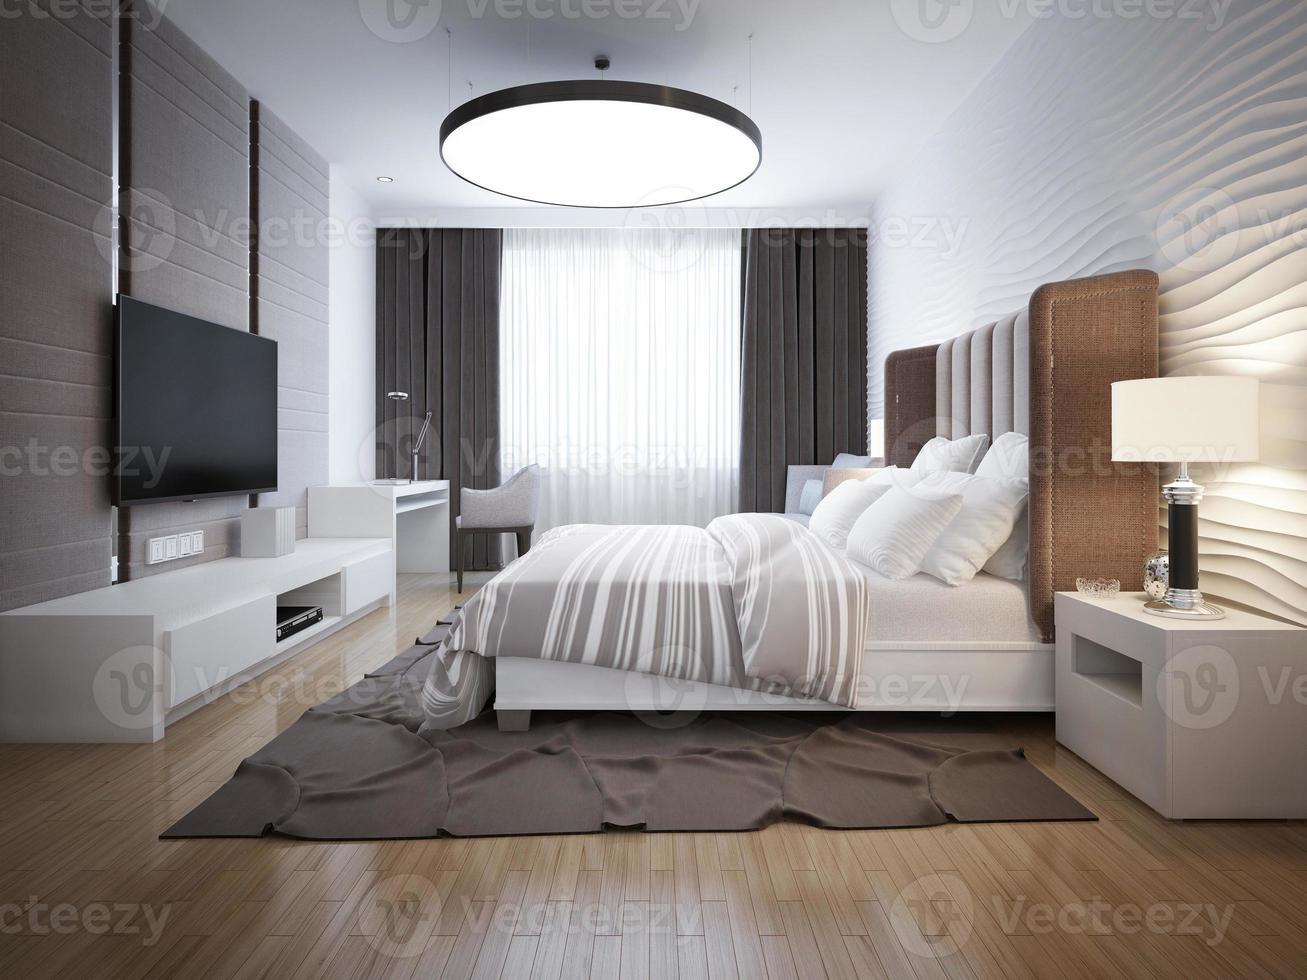 helles Design des modernen Schlafzimmers foto